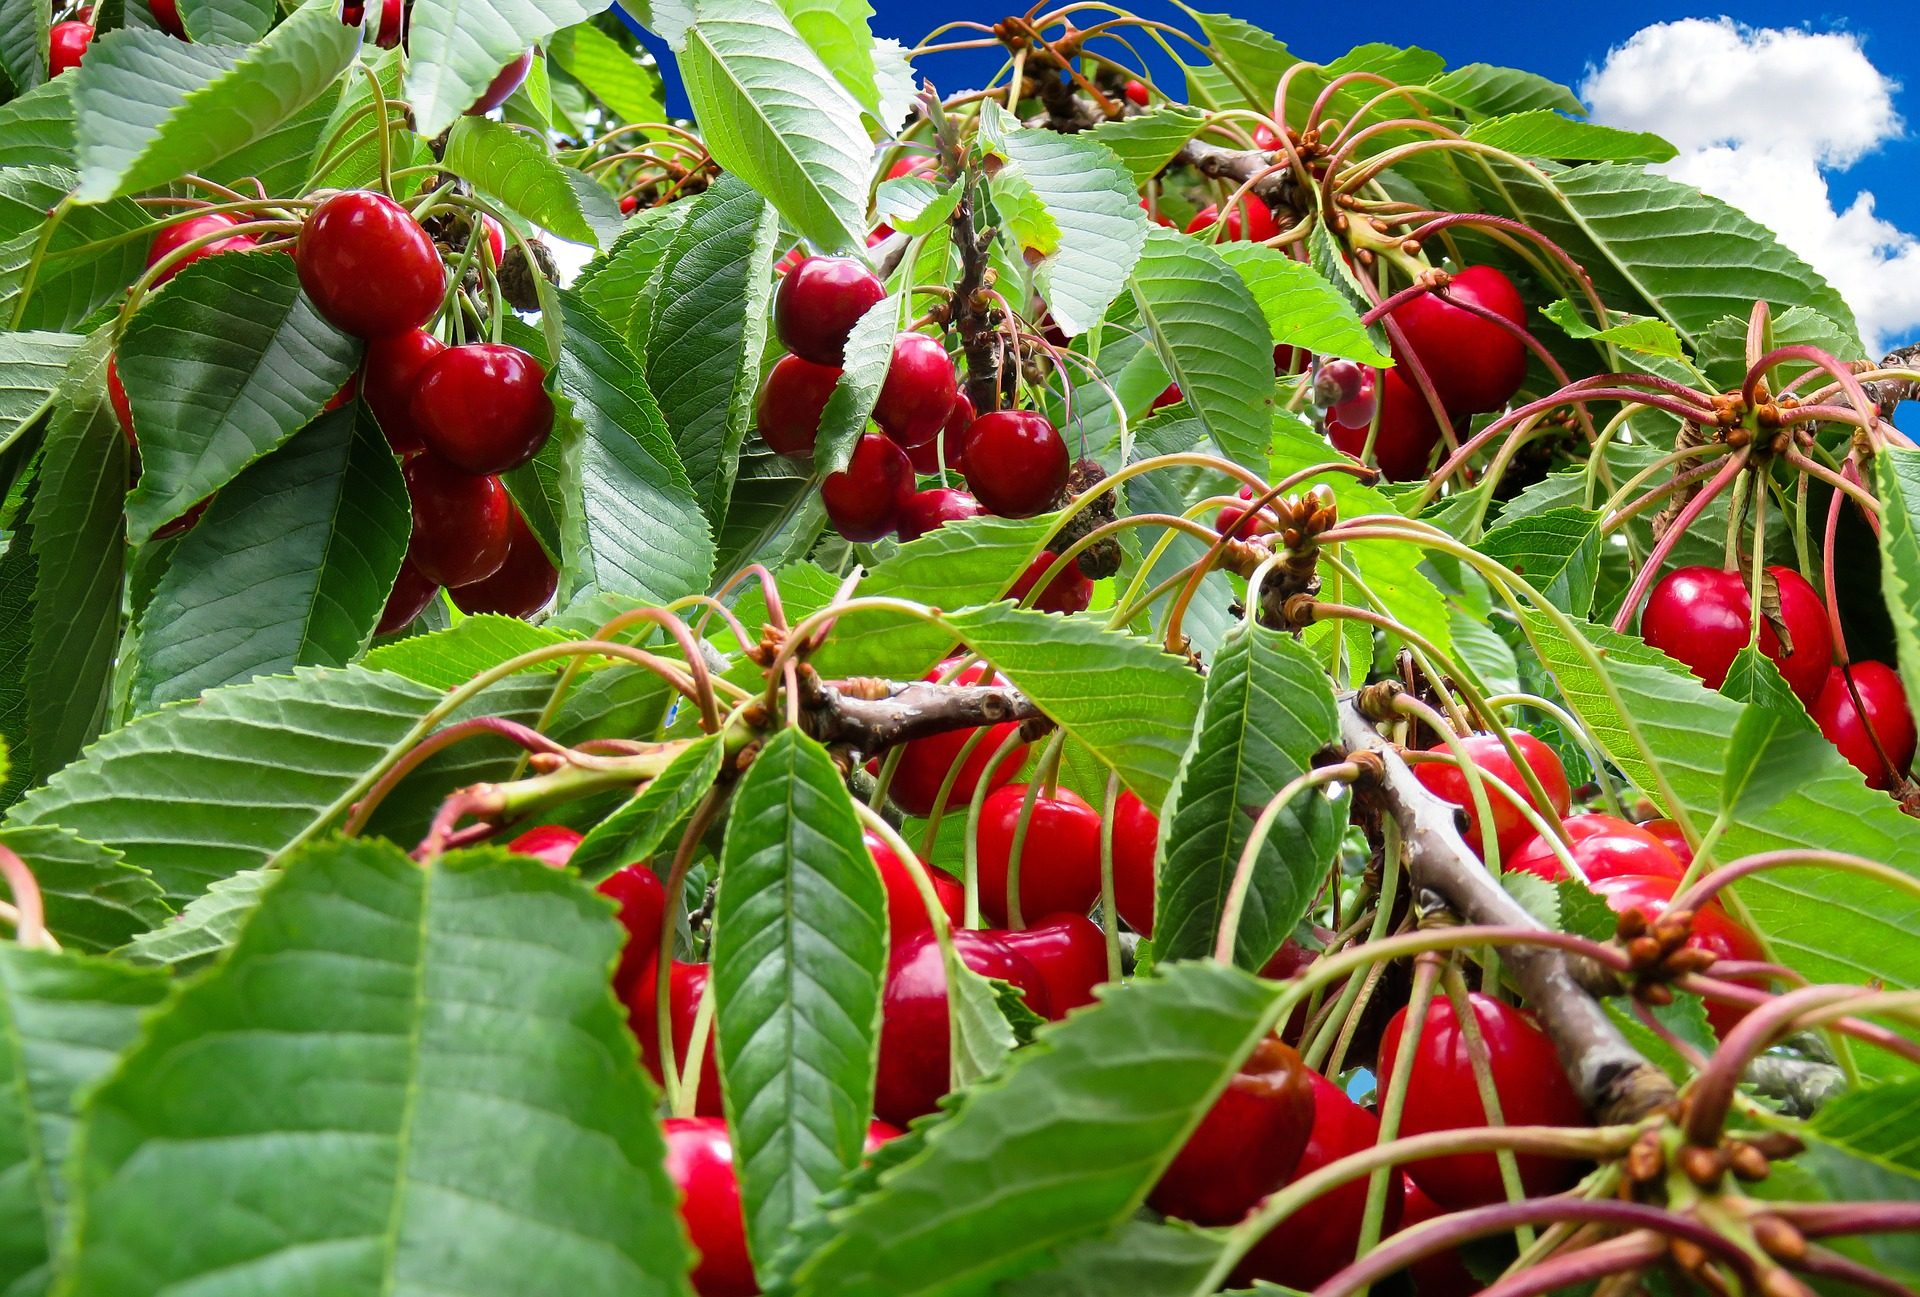 ciliegie, Plantation, Frutteto, árbol, Ciliegia, rami, foglie - Sfondi HD - Professor-falken.com